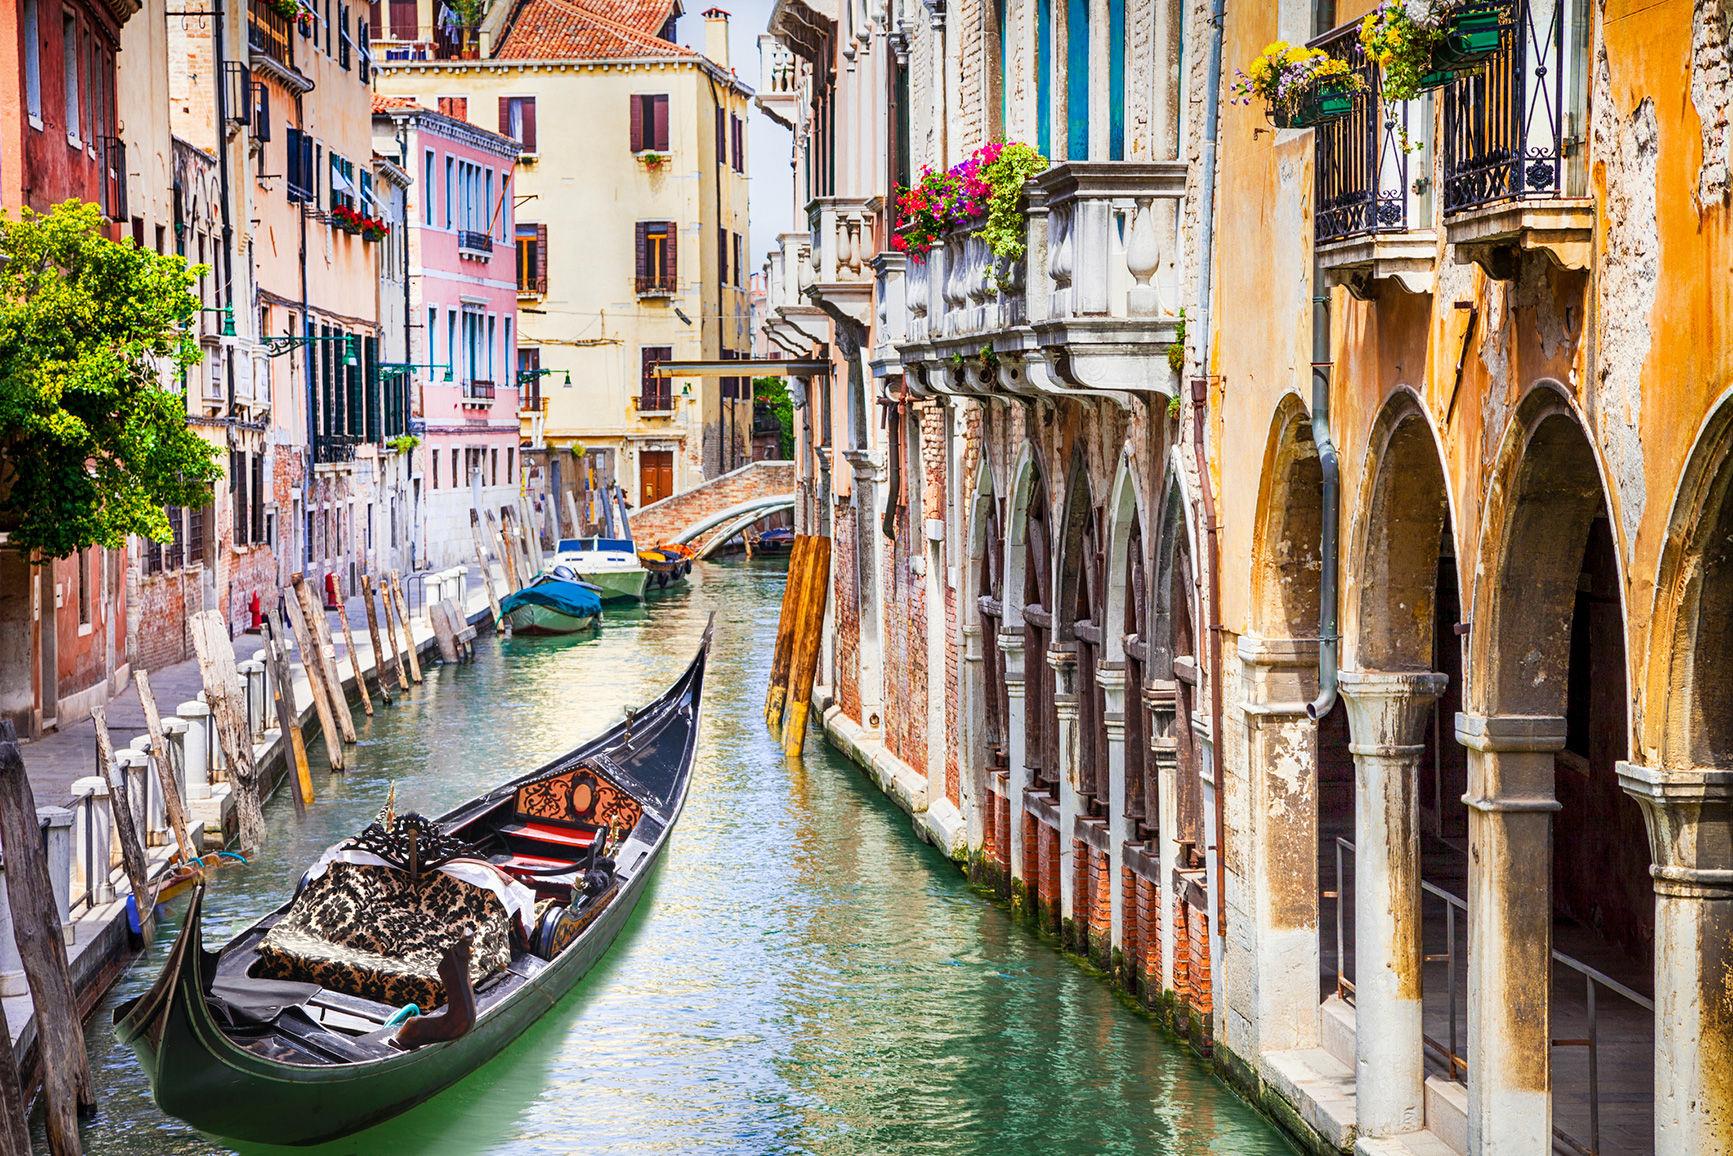 Benátky. Freeartist | istockphoto.com/